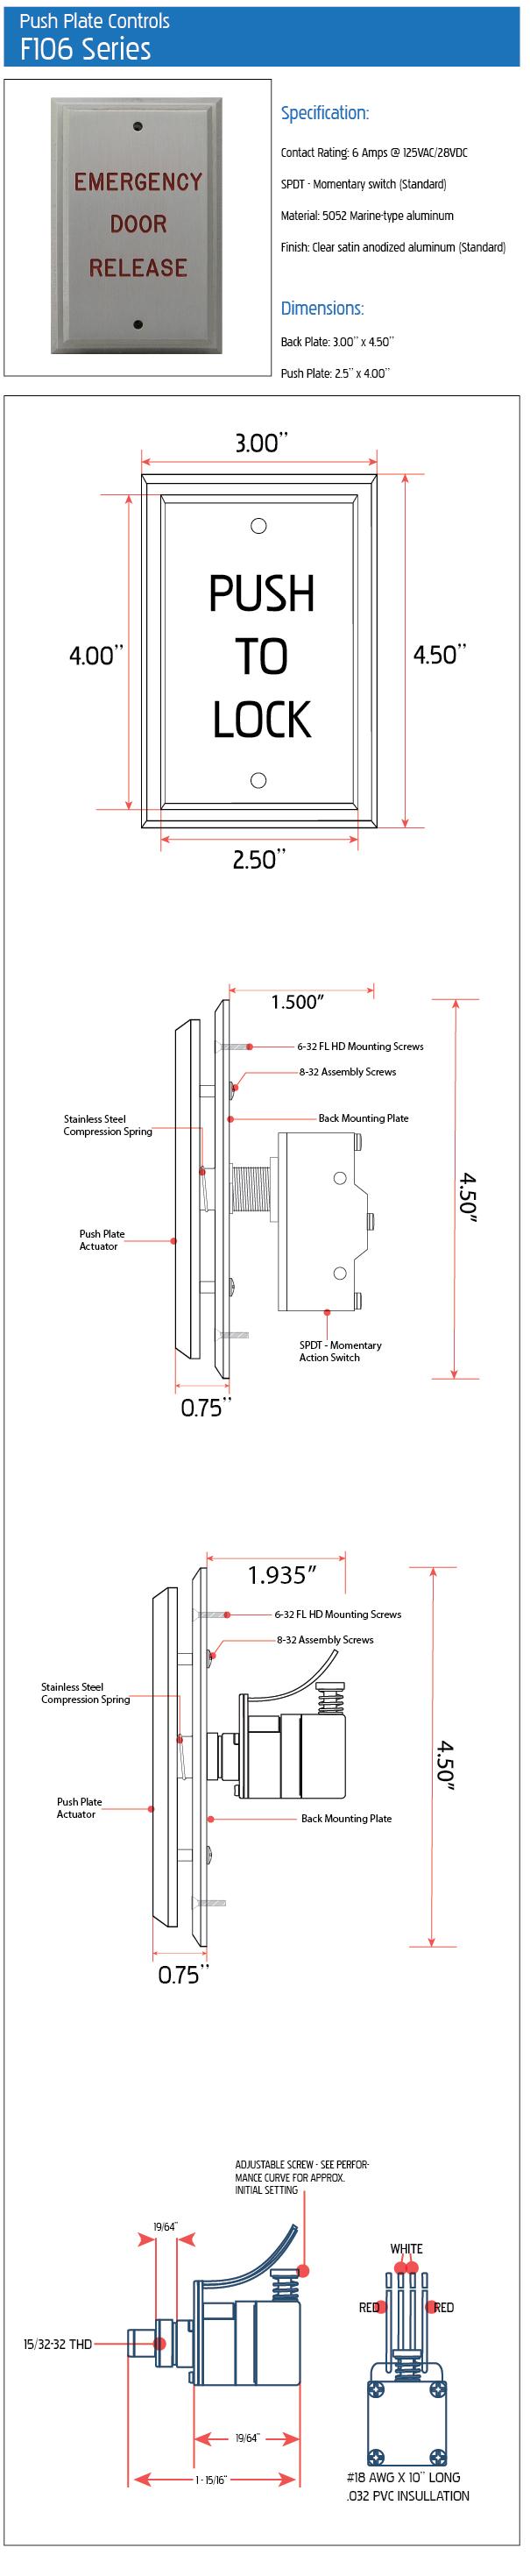 f106 spec sheet